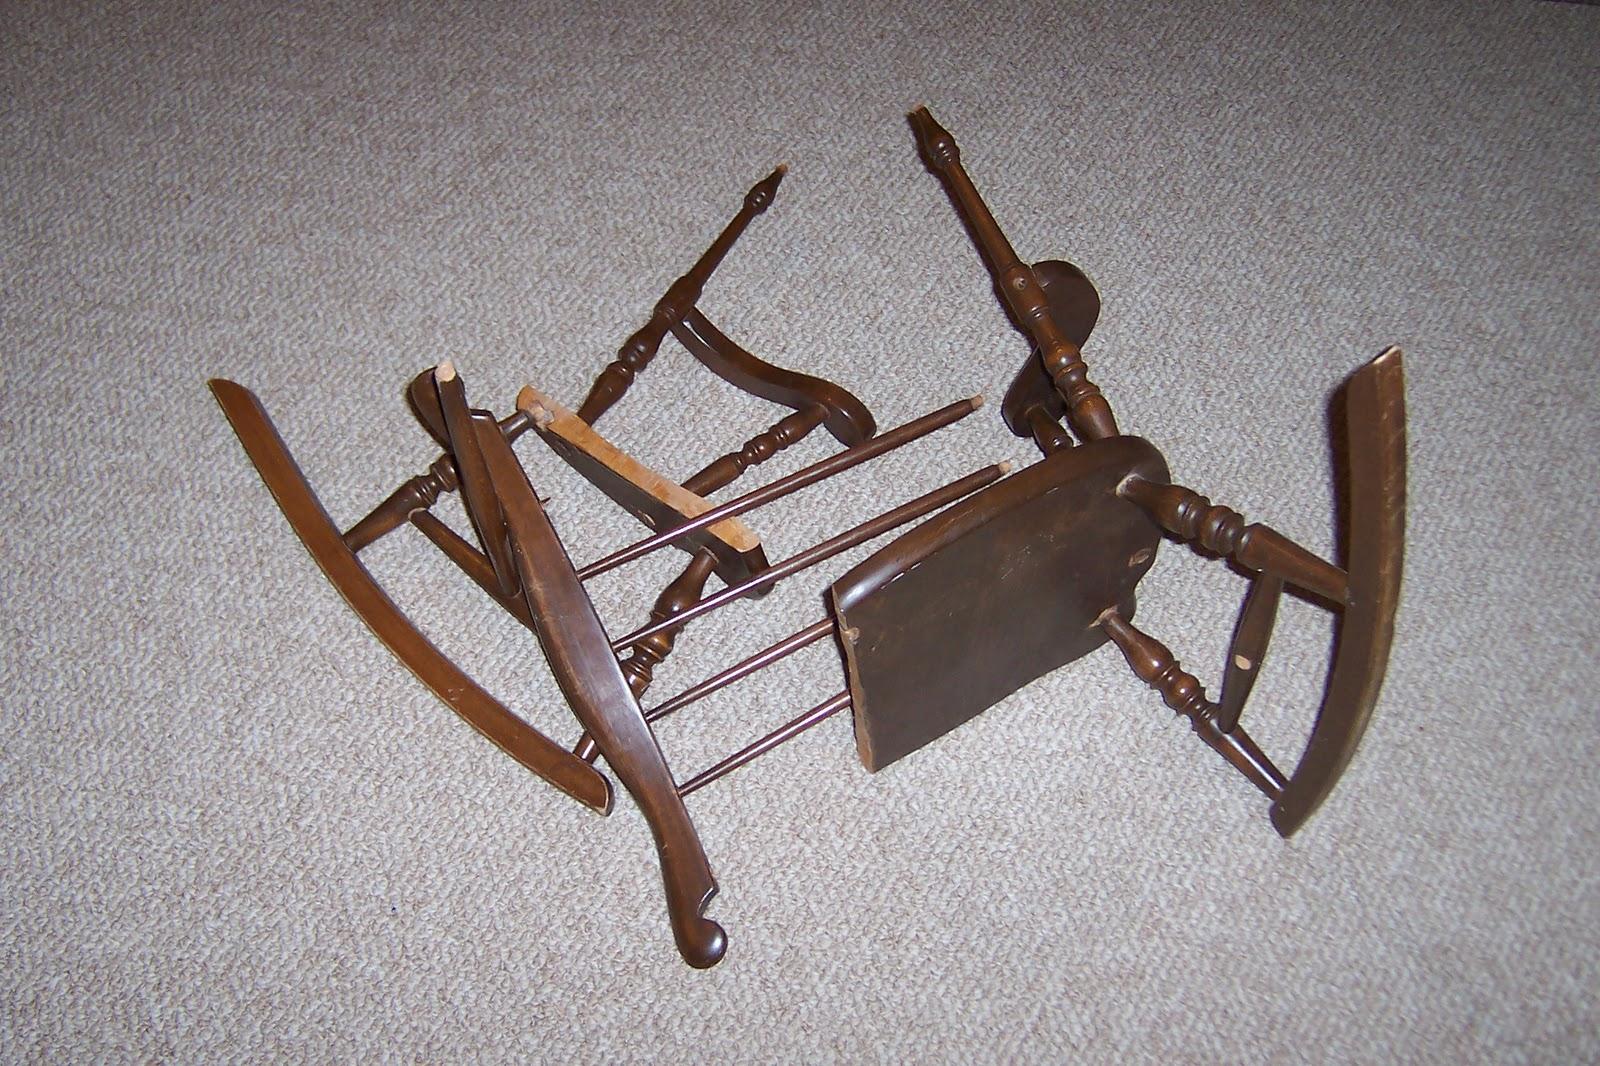 Dag wood shop notes january 2011